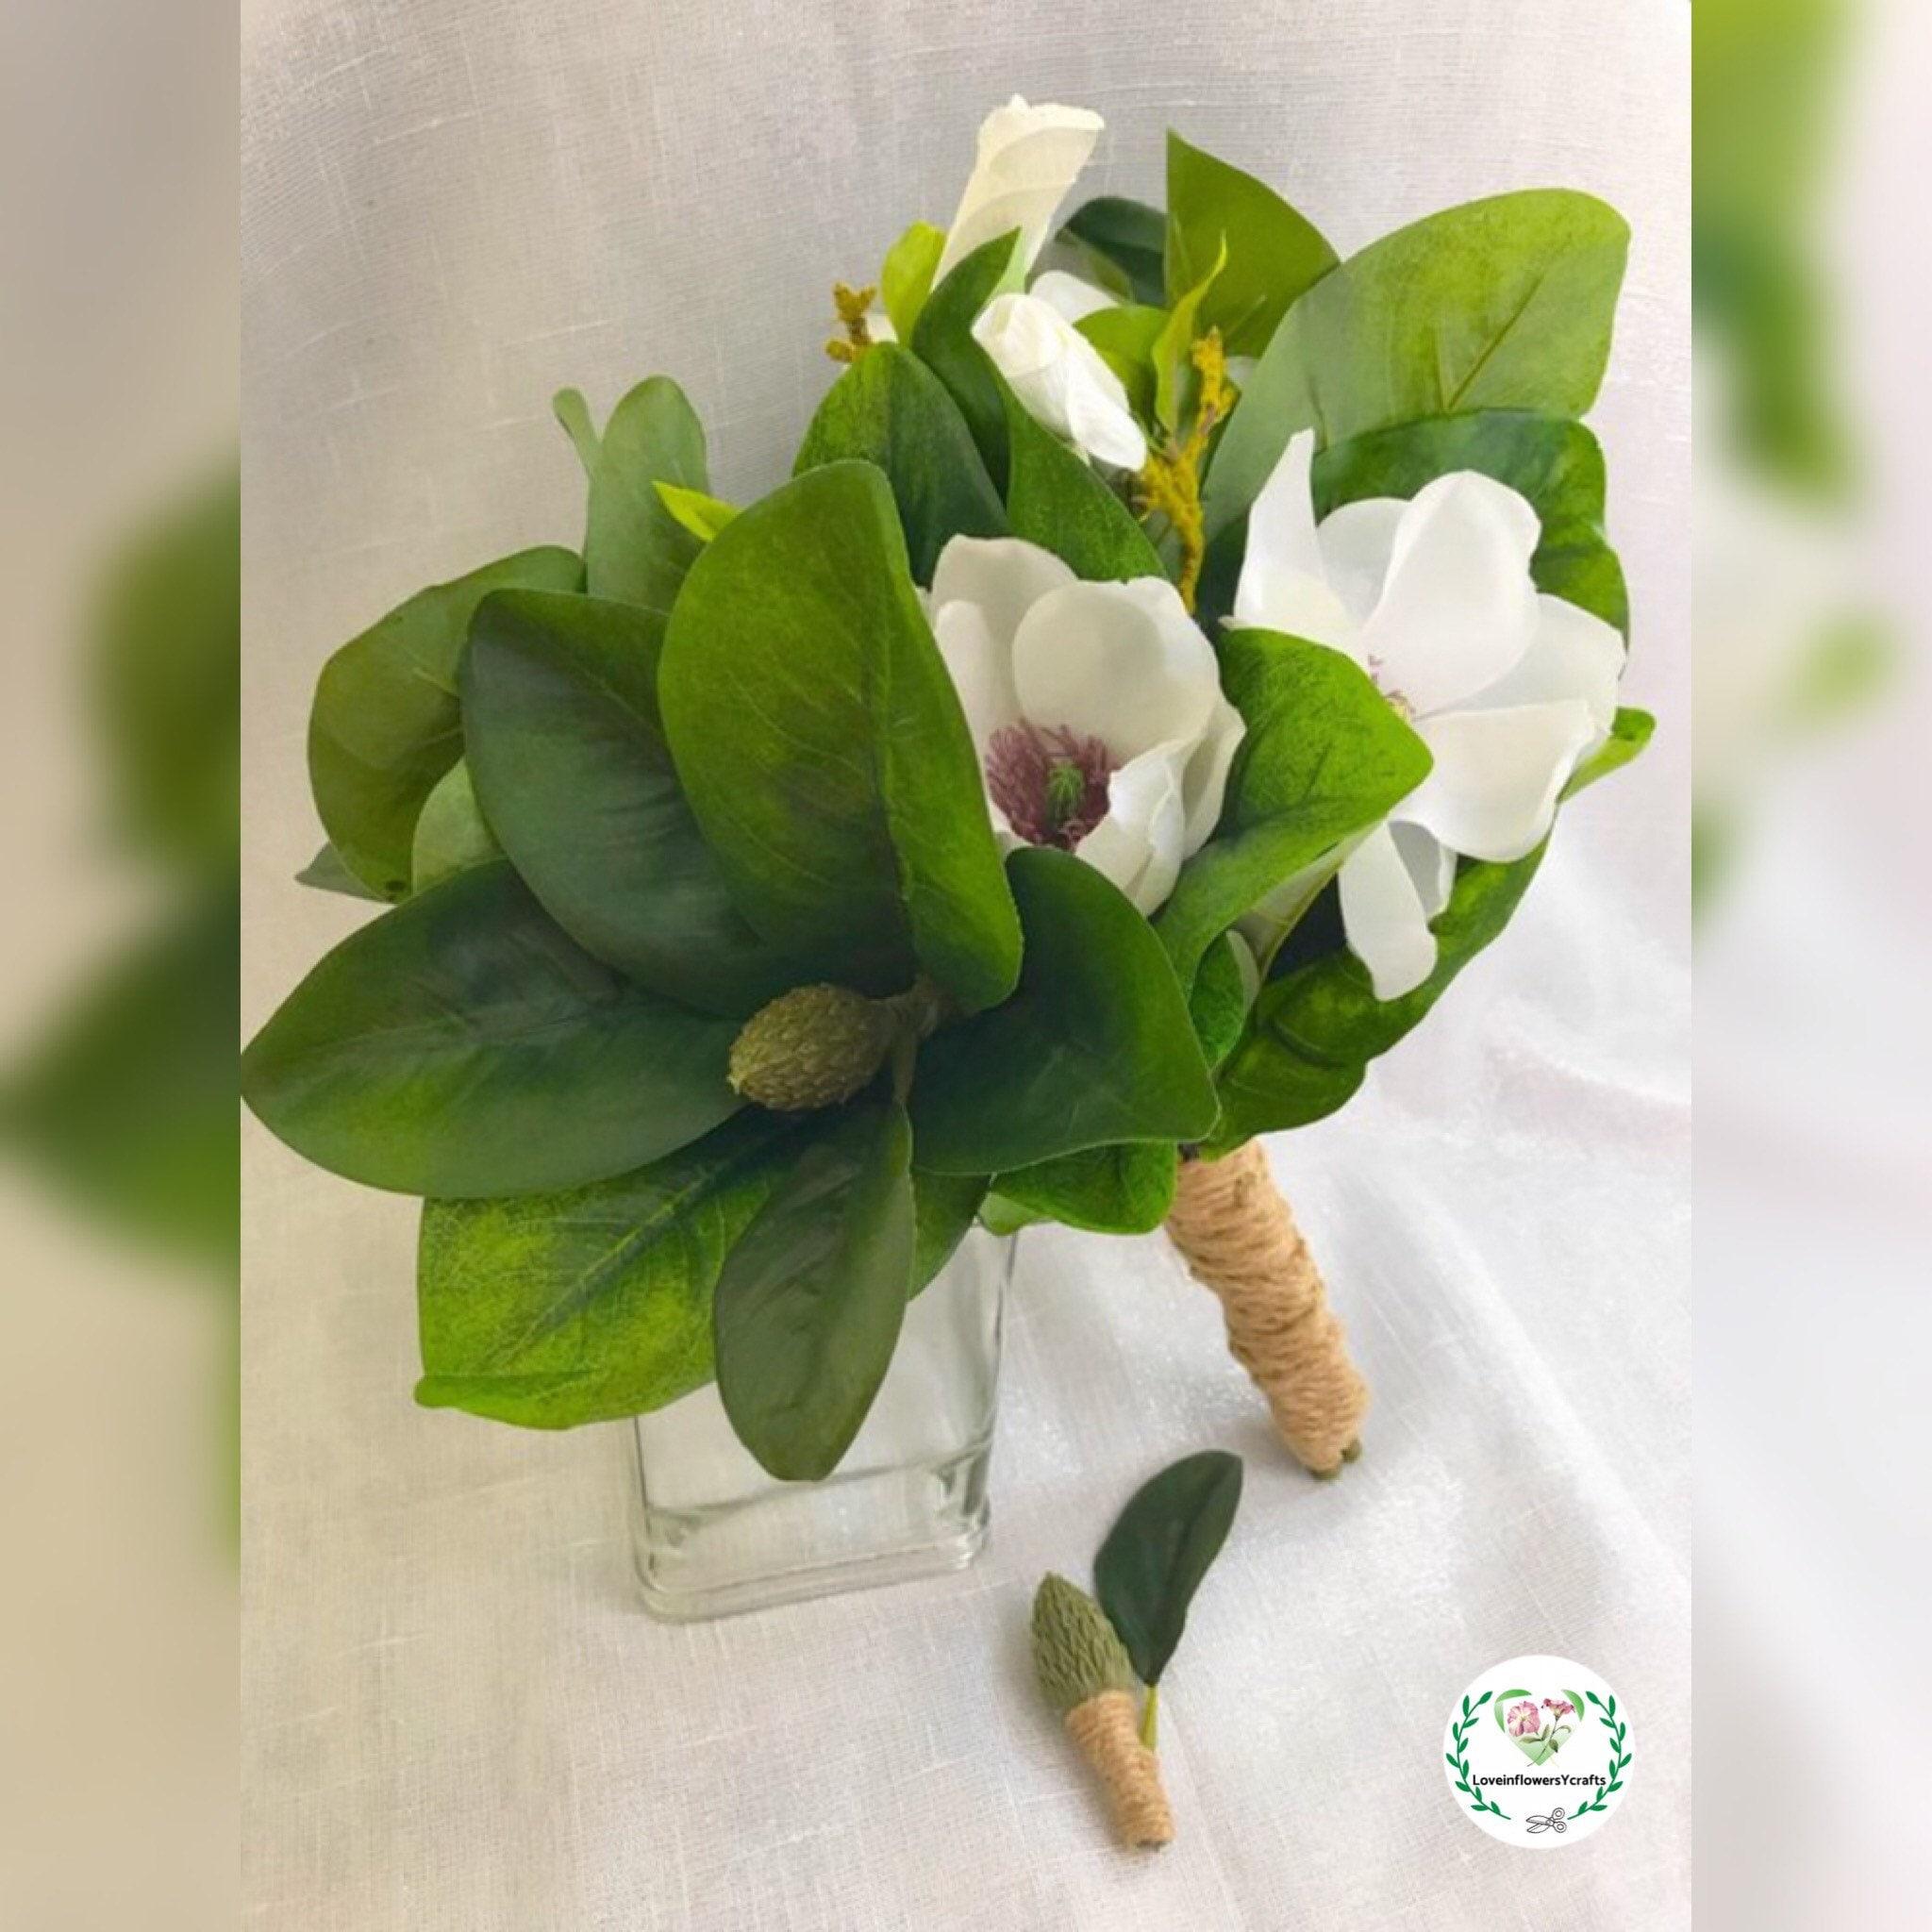 bridal bouquet boho bouquet magnolia silk magnolia bouquet ramo magnolia  ramo boho bouquet for wedding wedding flower boda magnolia white